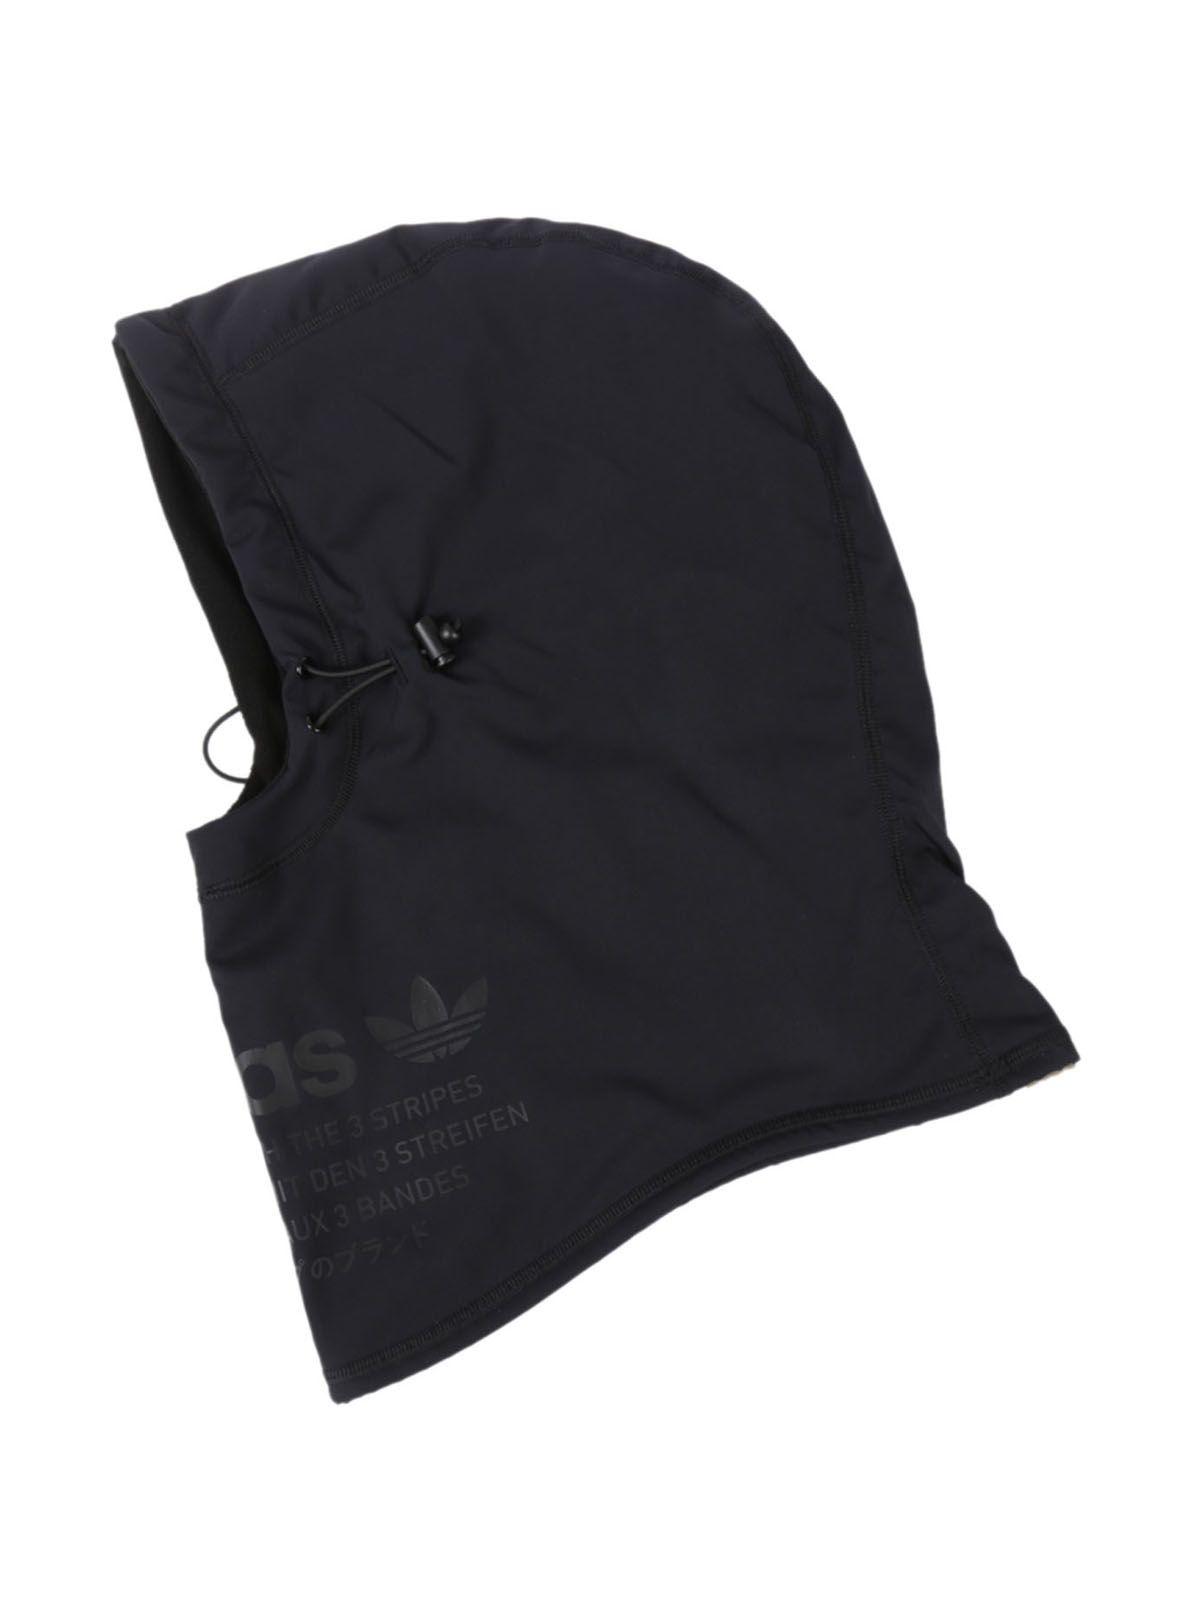 Adidas Balaclava Cap